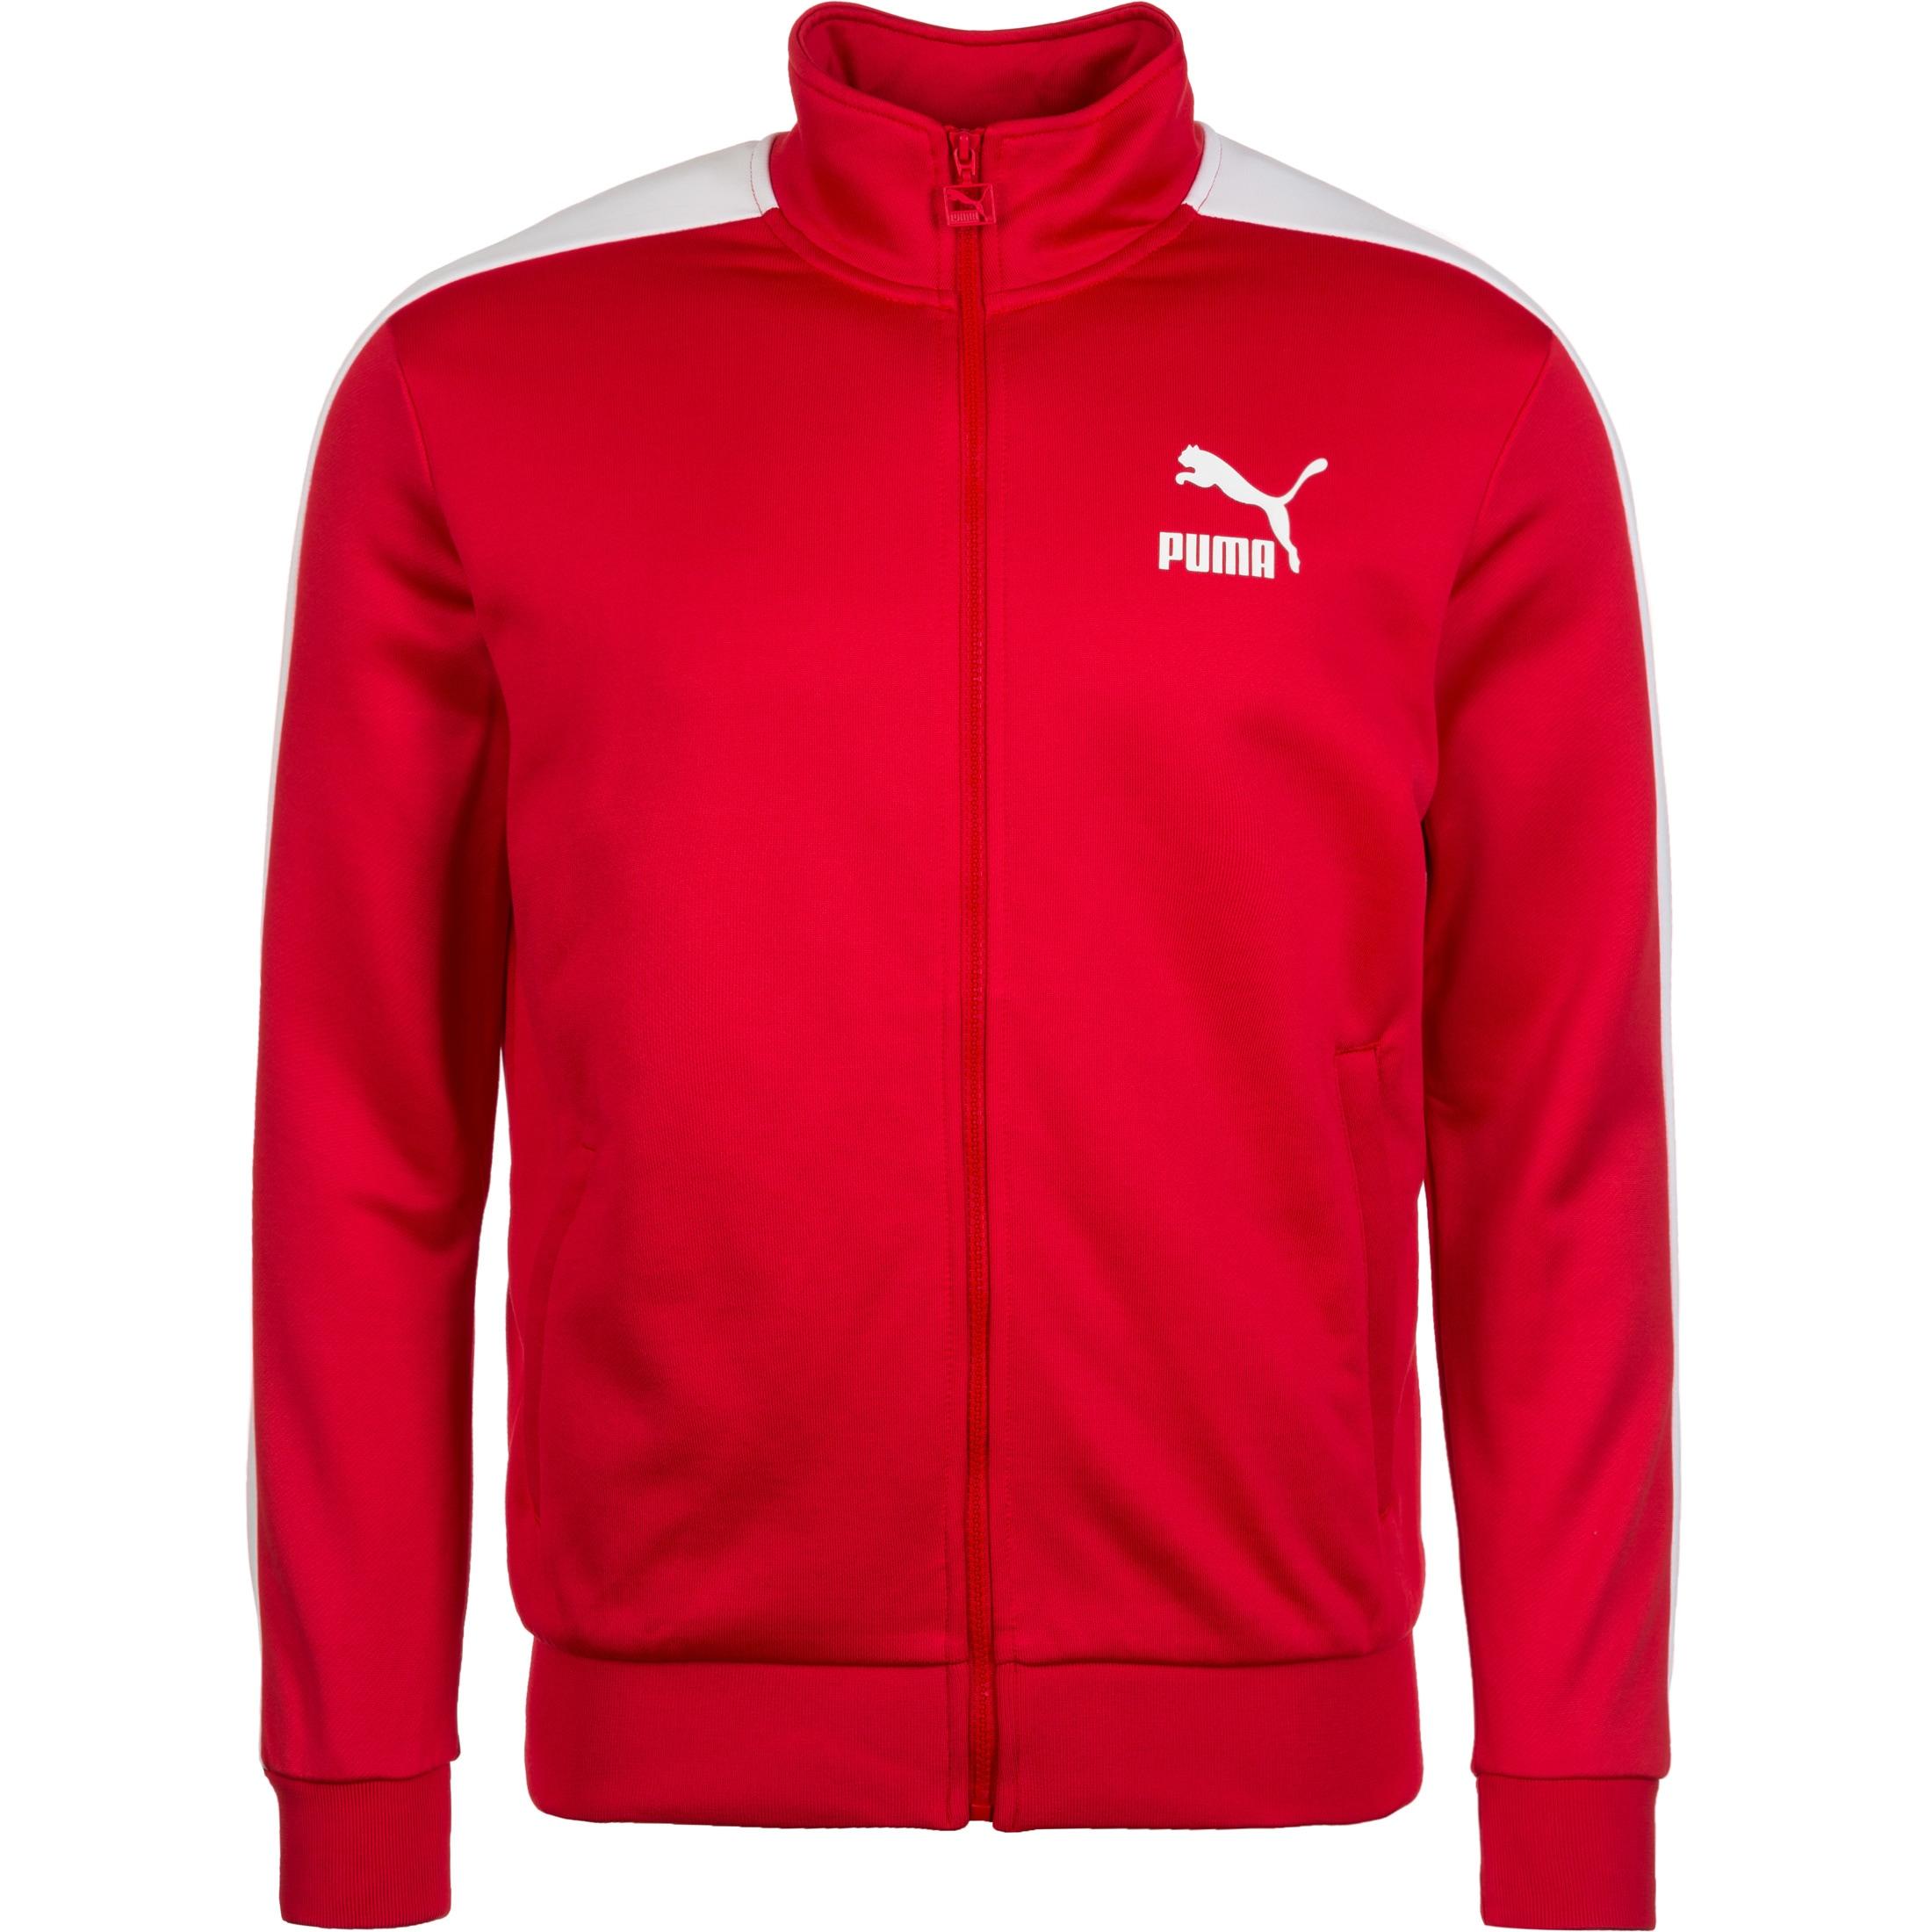 PUMA Sweatjacke Classics T7 Track | Bekleidung > Sweatshirts & -jacken > Sweatjacken | Puma